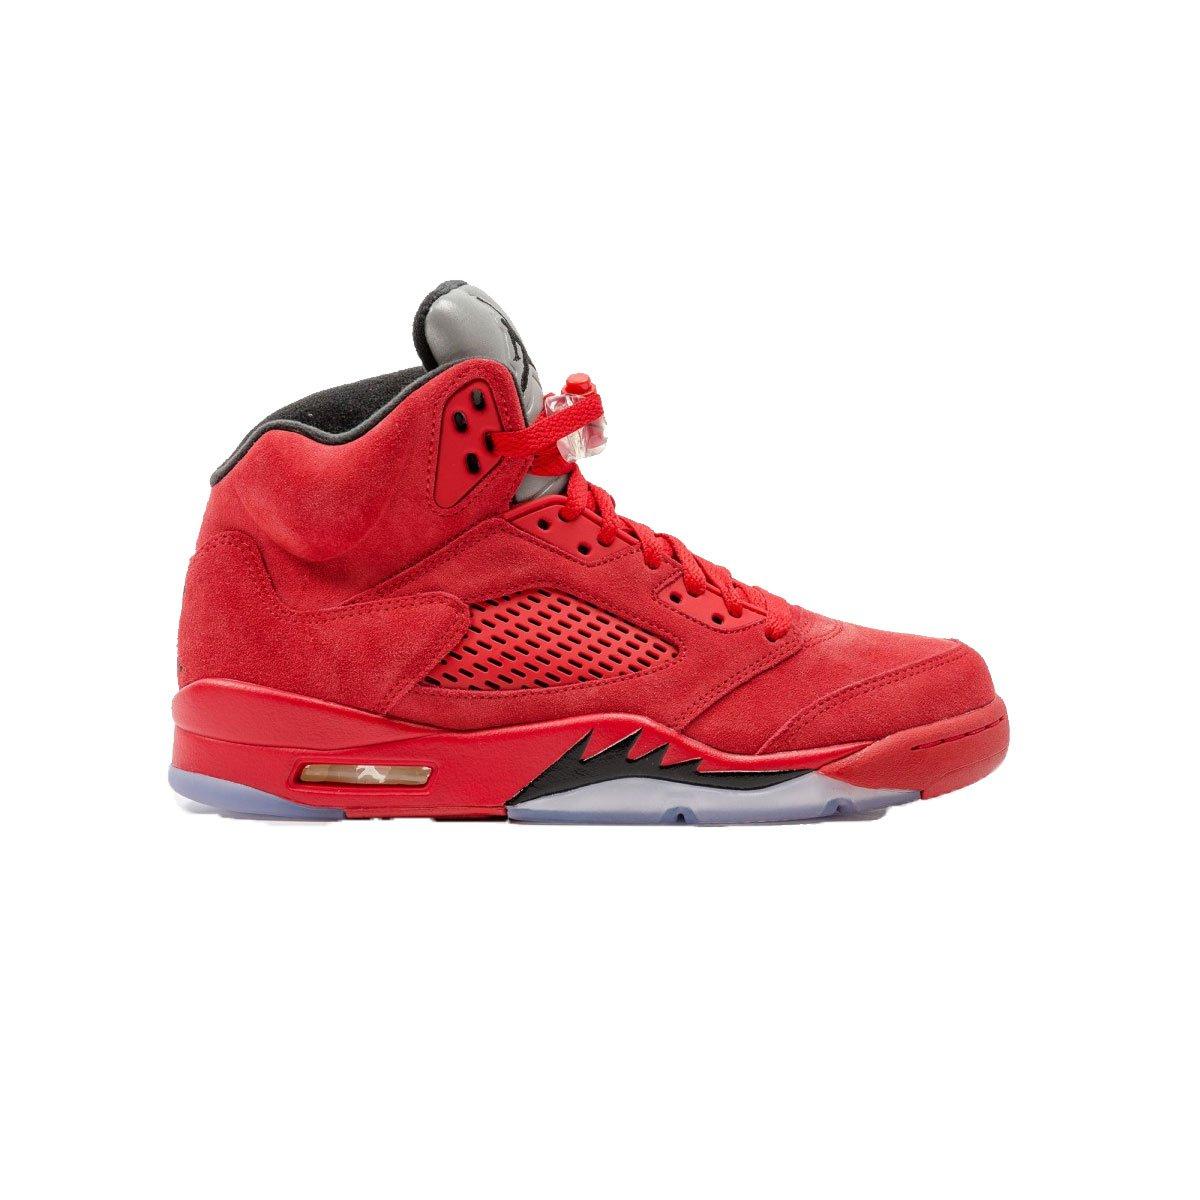 University red, black Nike Men's Air Jordan 5 Retro Basketball shoes